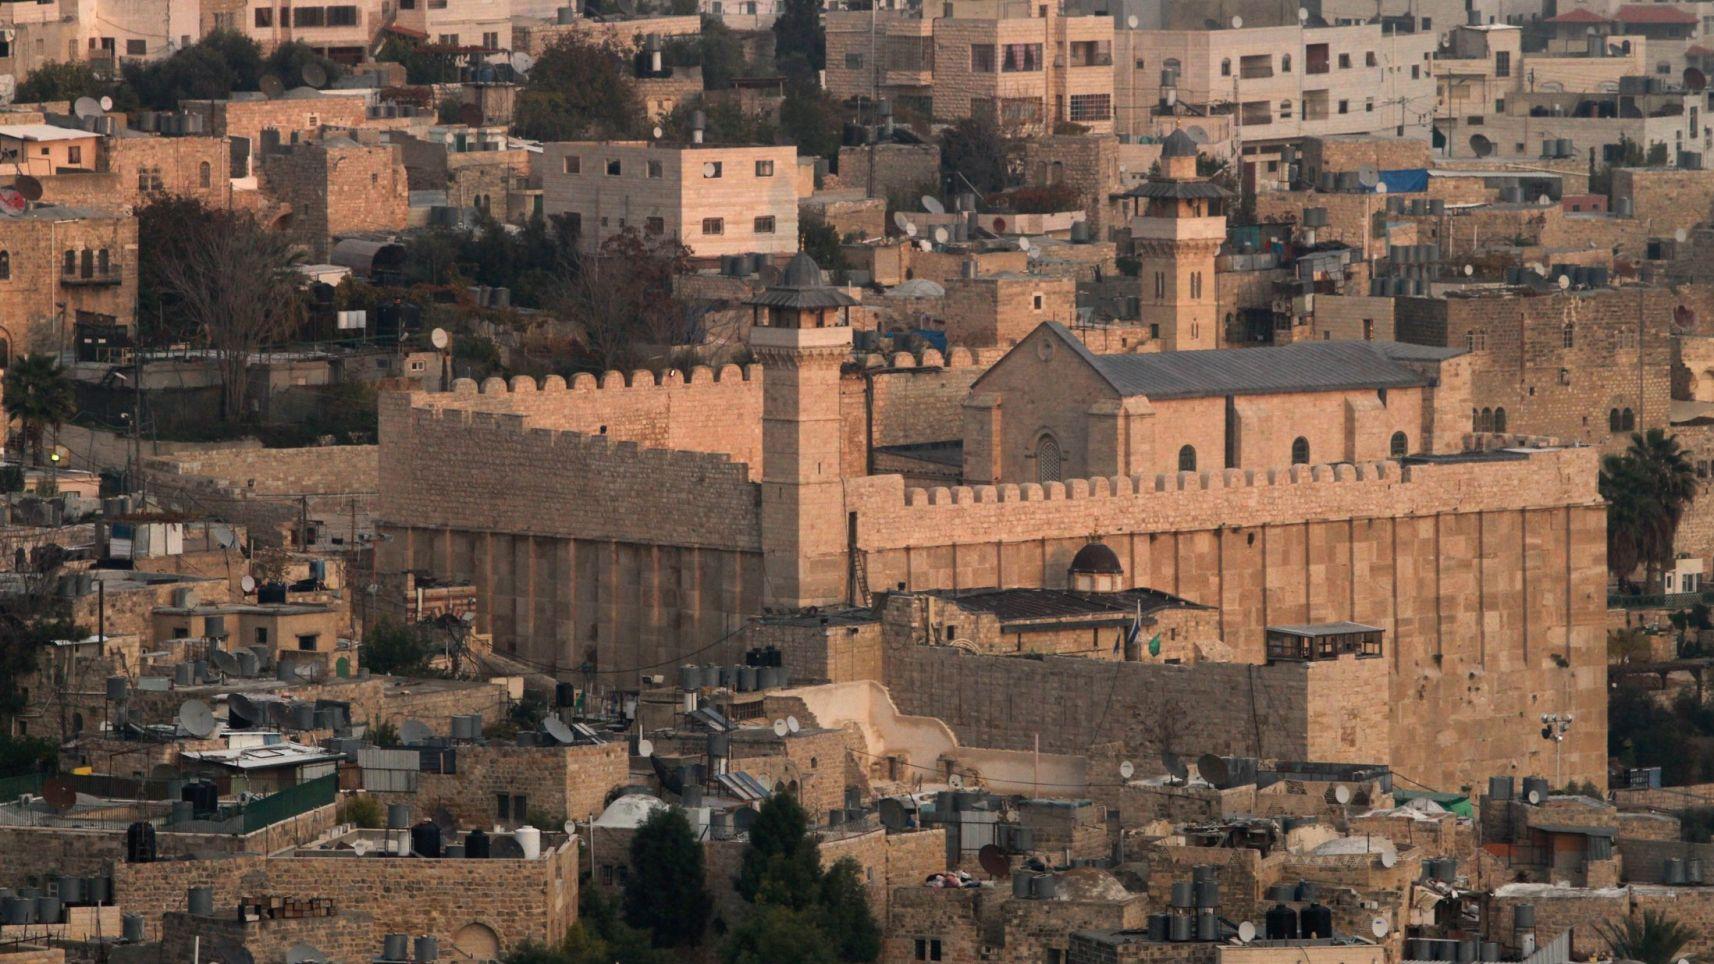 UNESCO Recognizes More Palestinian Heritage Sites, UNESCO Recognizes More Palestinian Heritage Sites